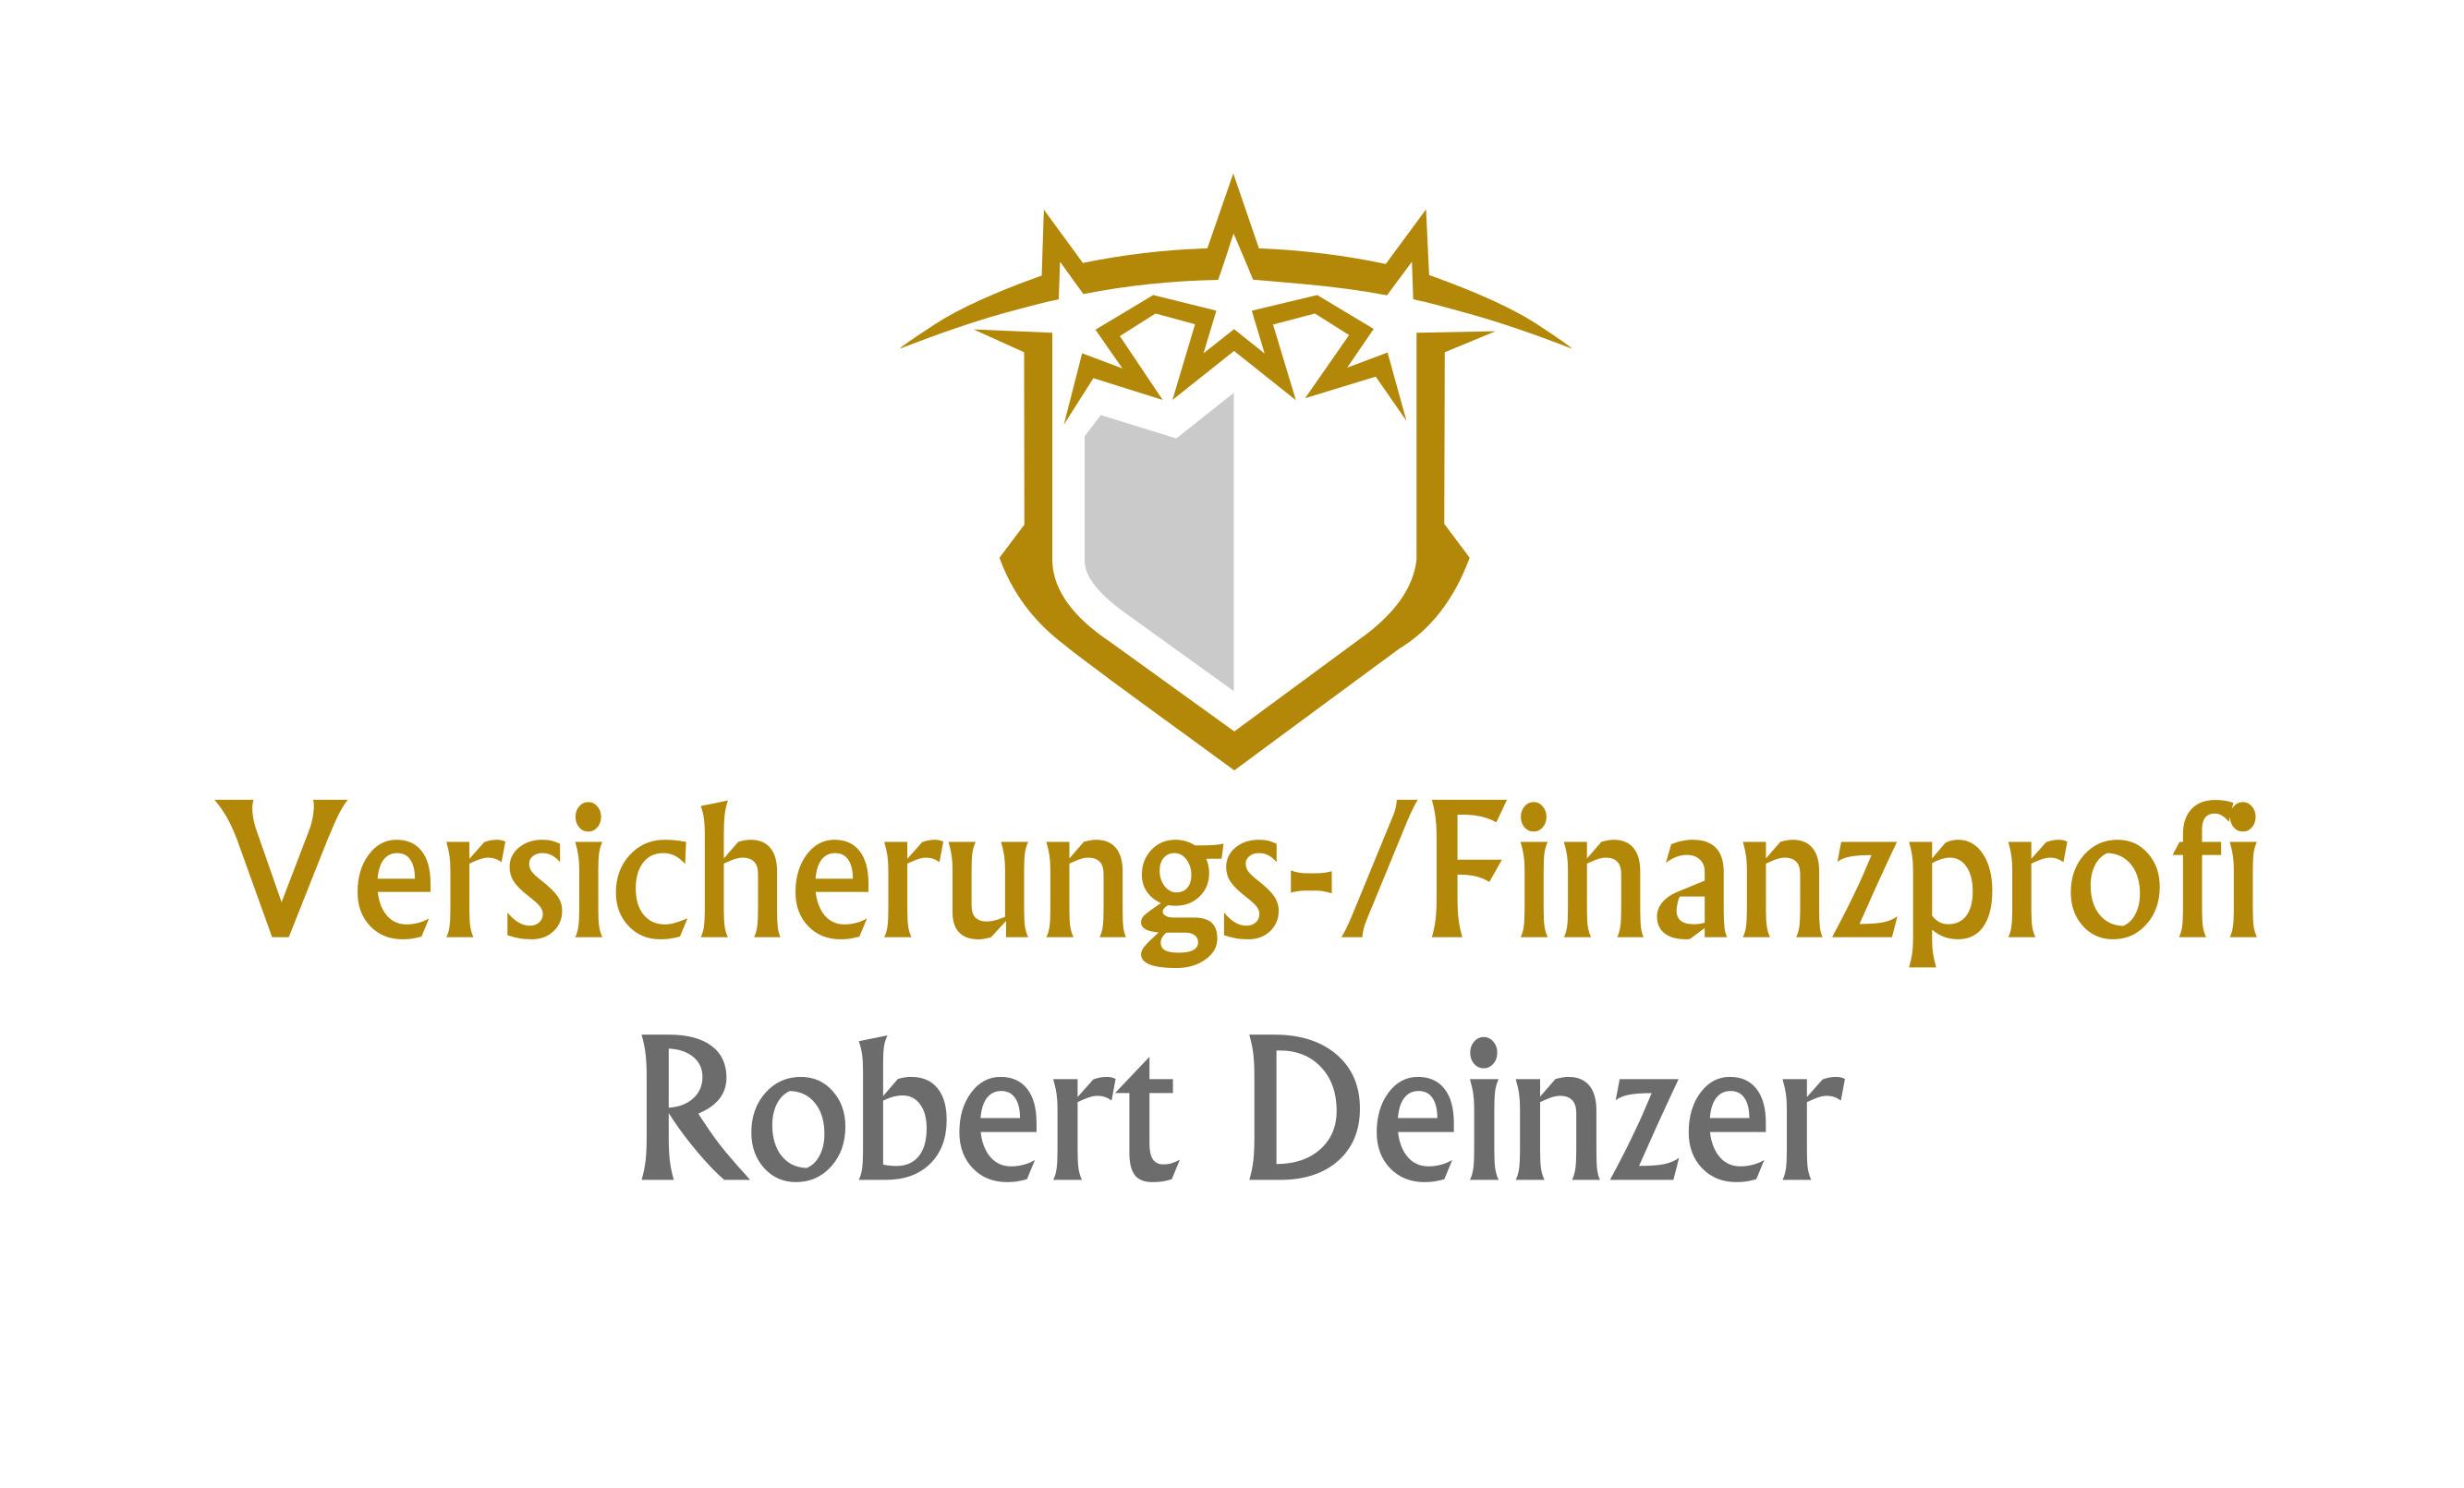 SIGNAL IDUNA Versicherung Robert Deinzer